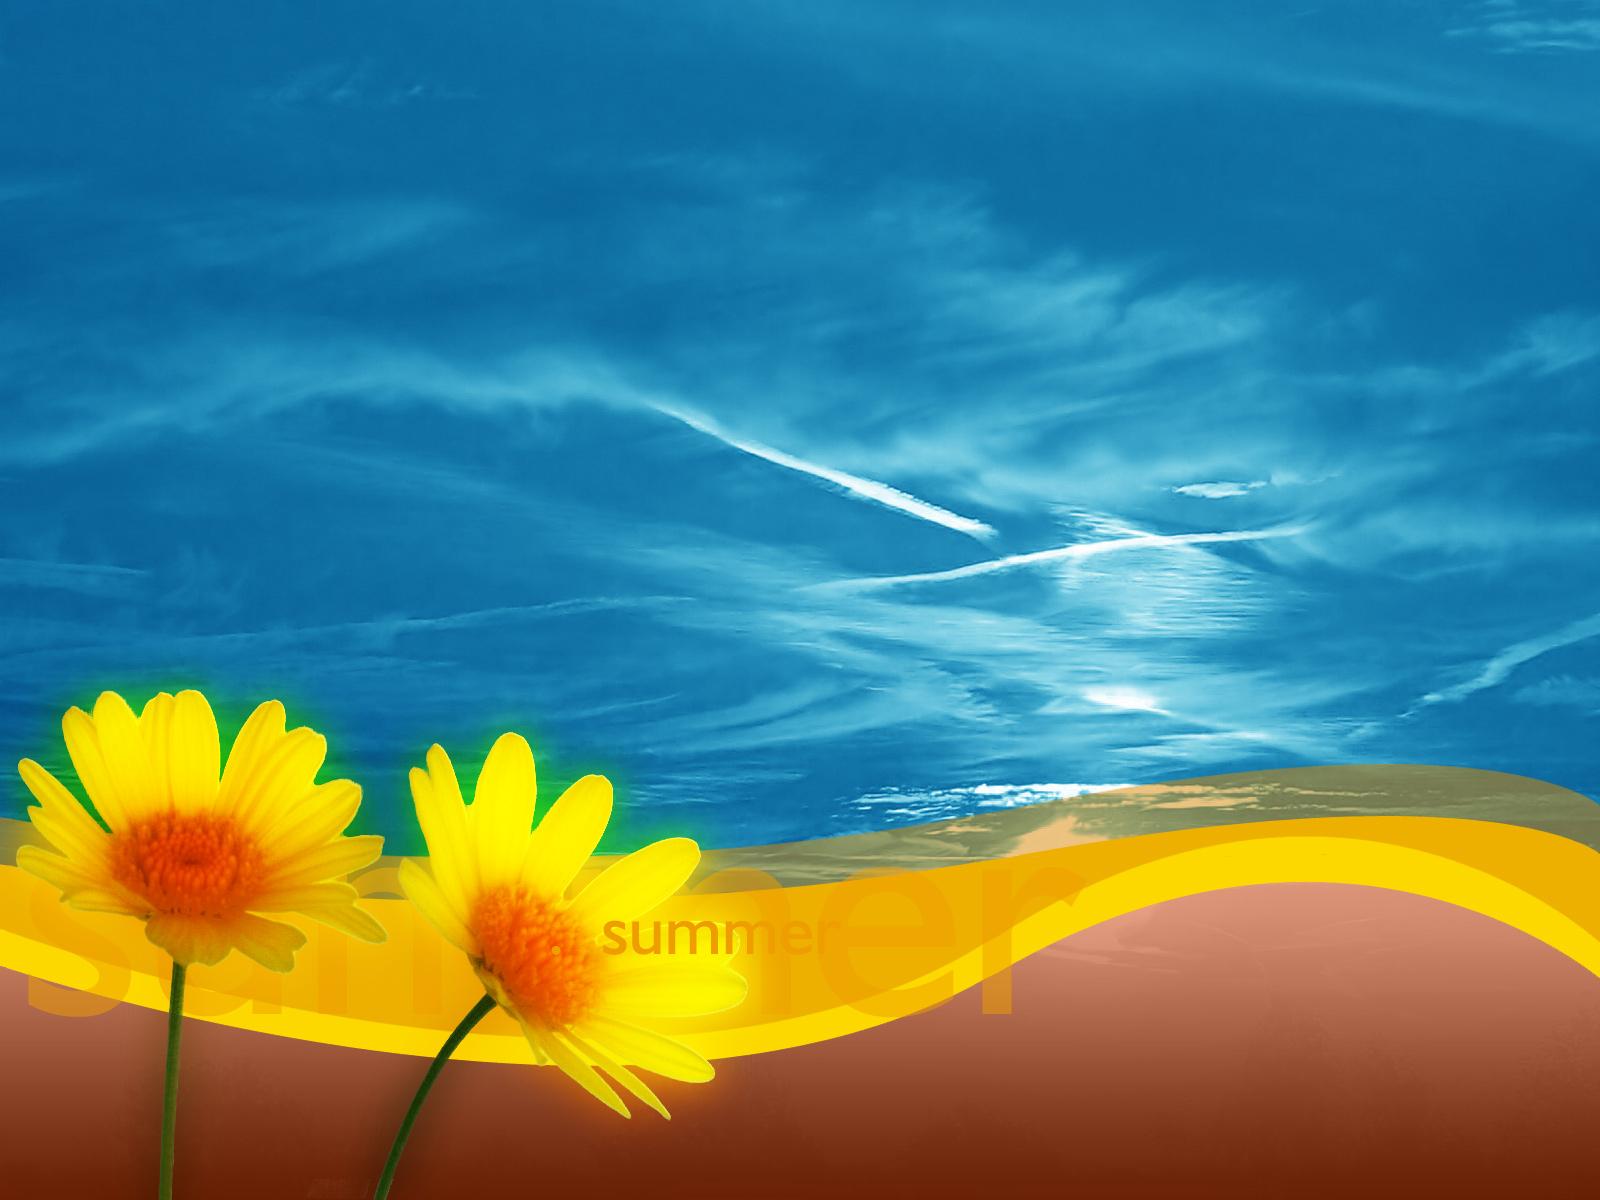 Summer Wallpaper HD For Desktop Wallpaper HD And Background 1600x1200